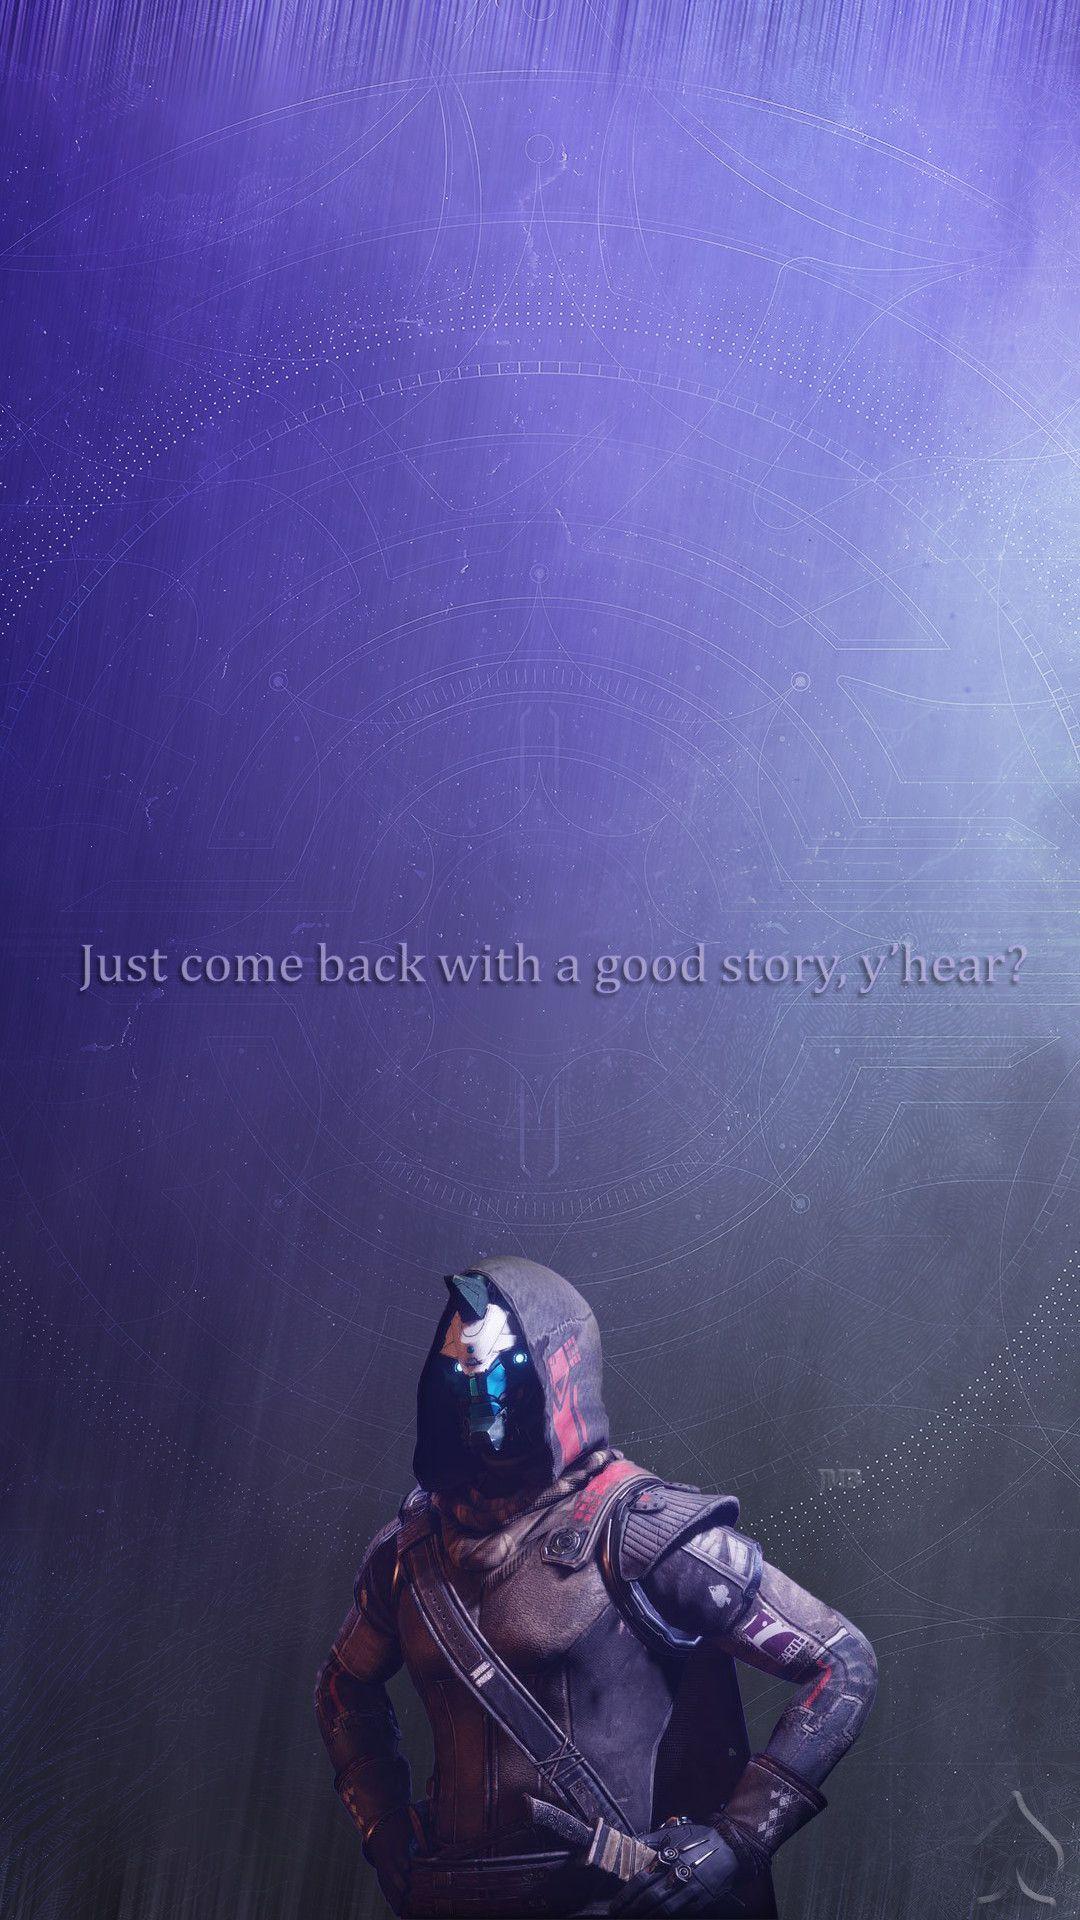 Destiny 2 Forsaken Wallpapers Background Hupages Download Iphone Wallpapers Destiny Backgrounds Destiny Game Destiny Video Game